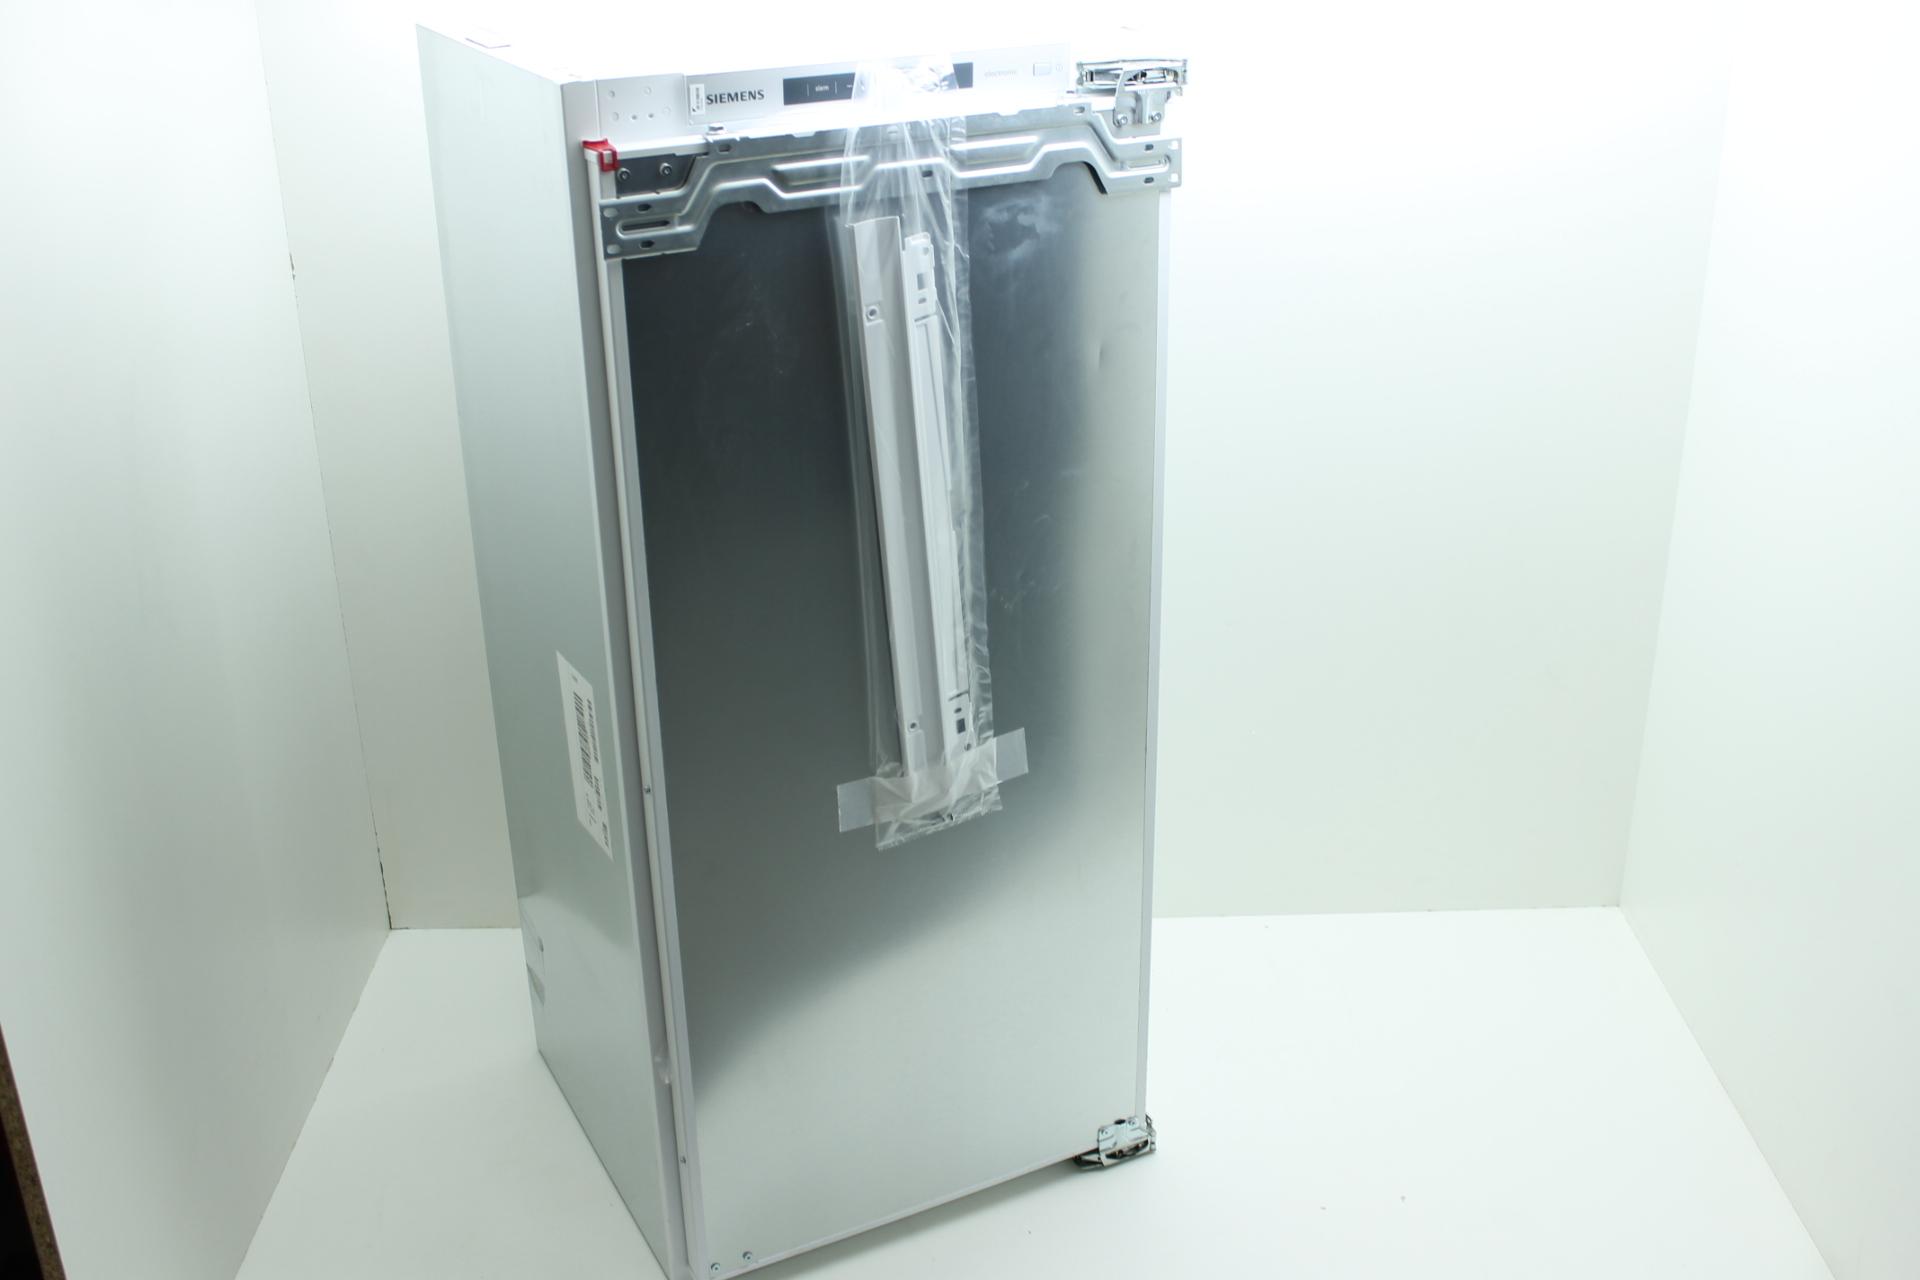 Siemens Kühlschrank Vergleich : Siemens kühlschrank einbau kühlautomat ki laf neu unbenutzt